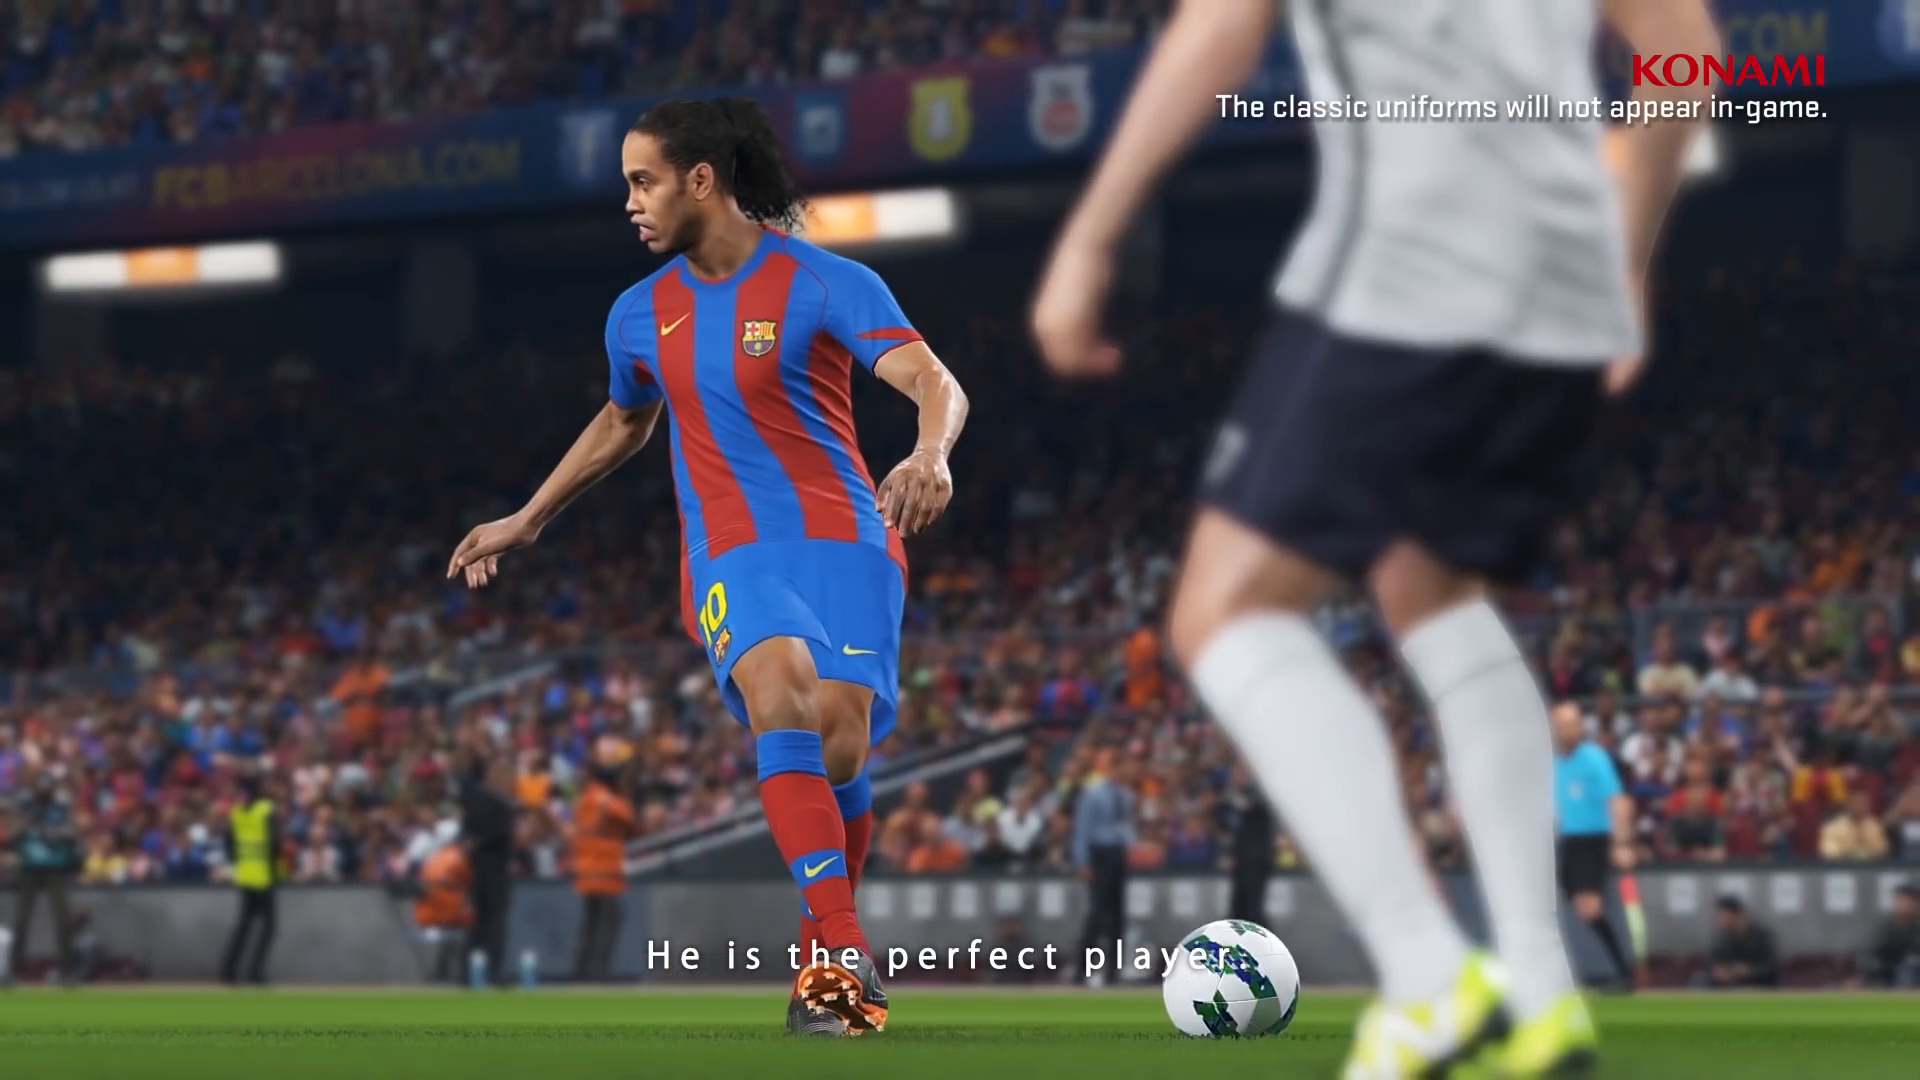 PES 2018 welcomes Ronaldinho - Pro Evolution Soccer 2018